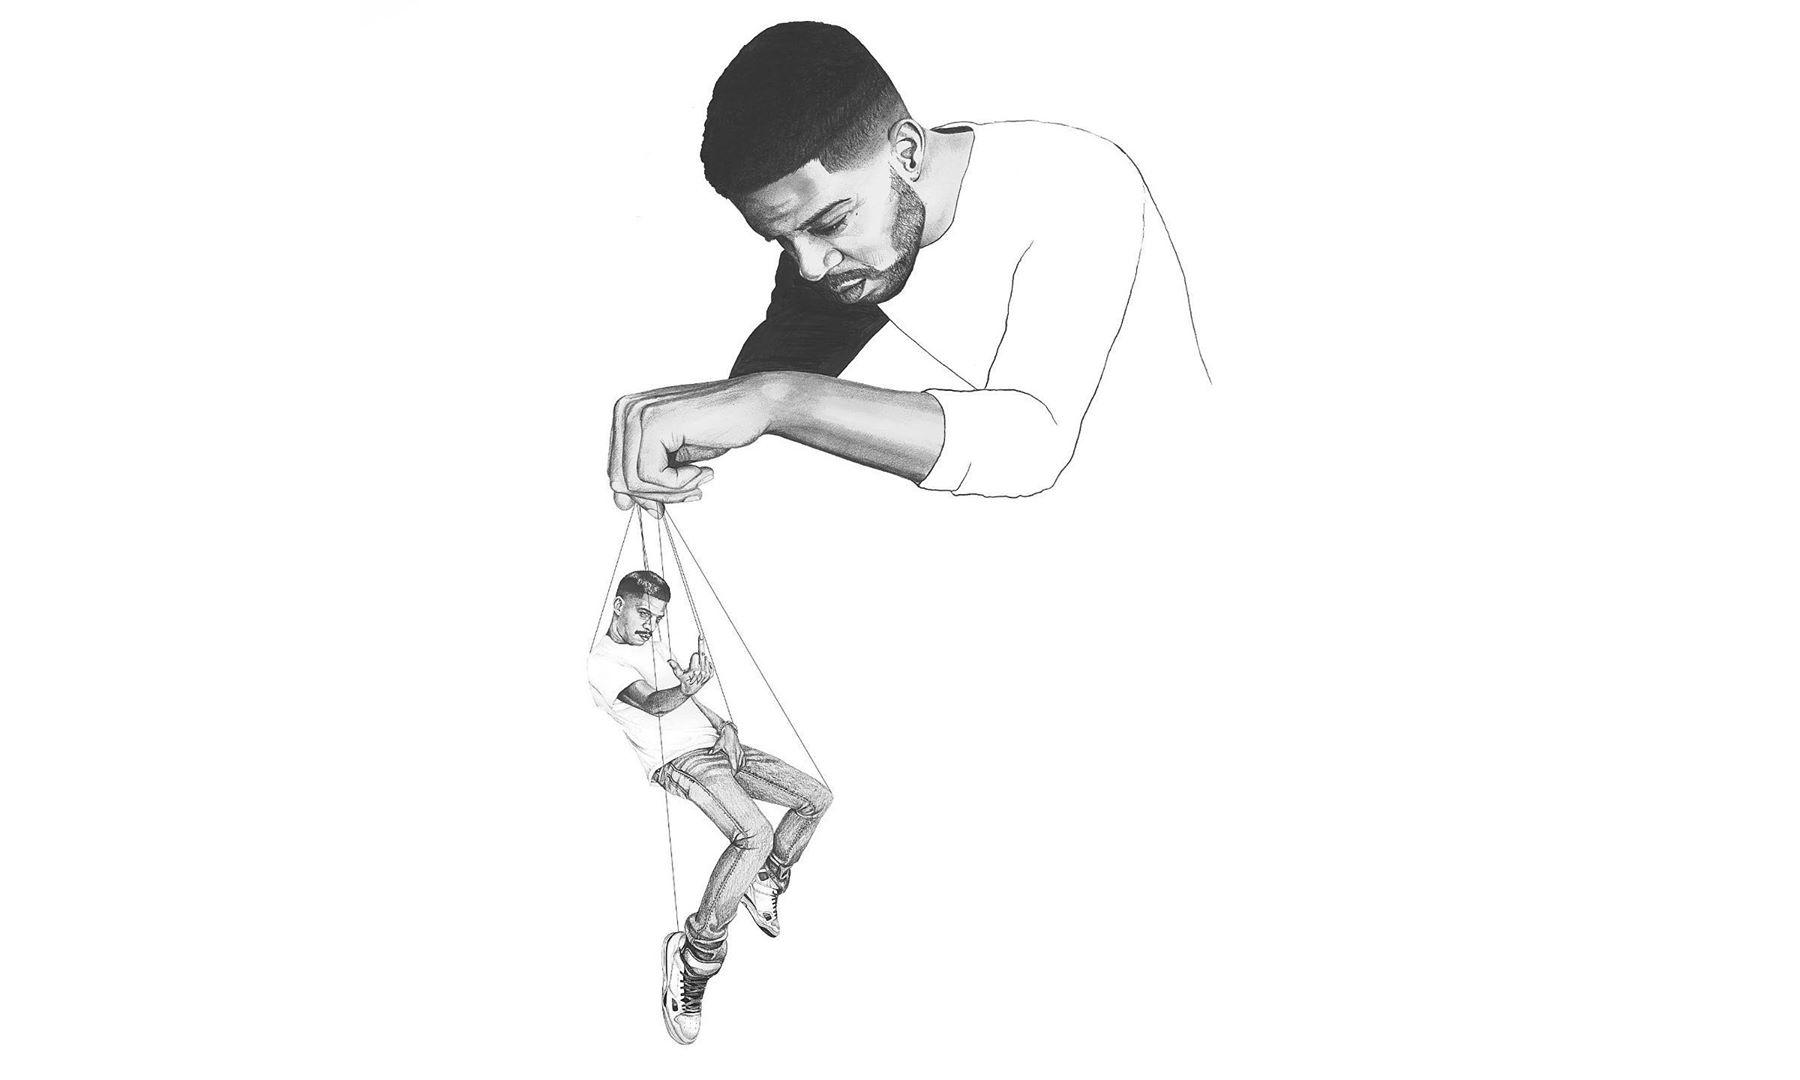 Virgil Abloh 为 Kid Cudi 新单曲设计封面艺术